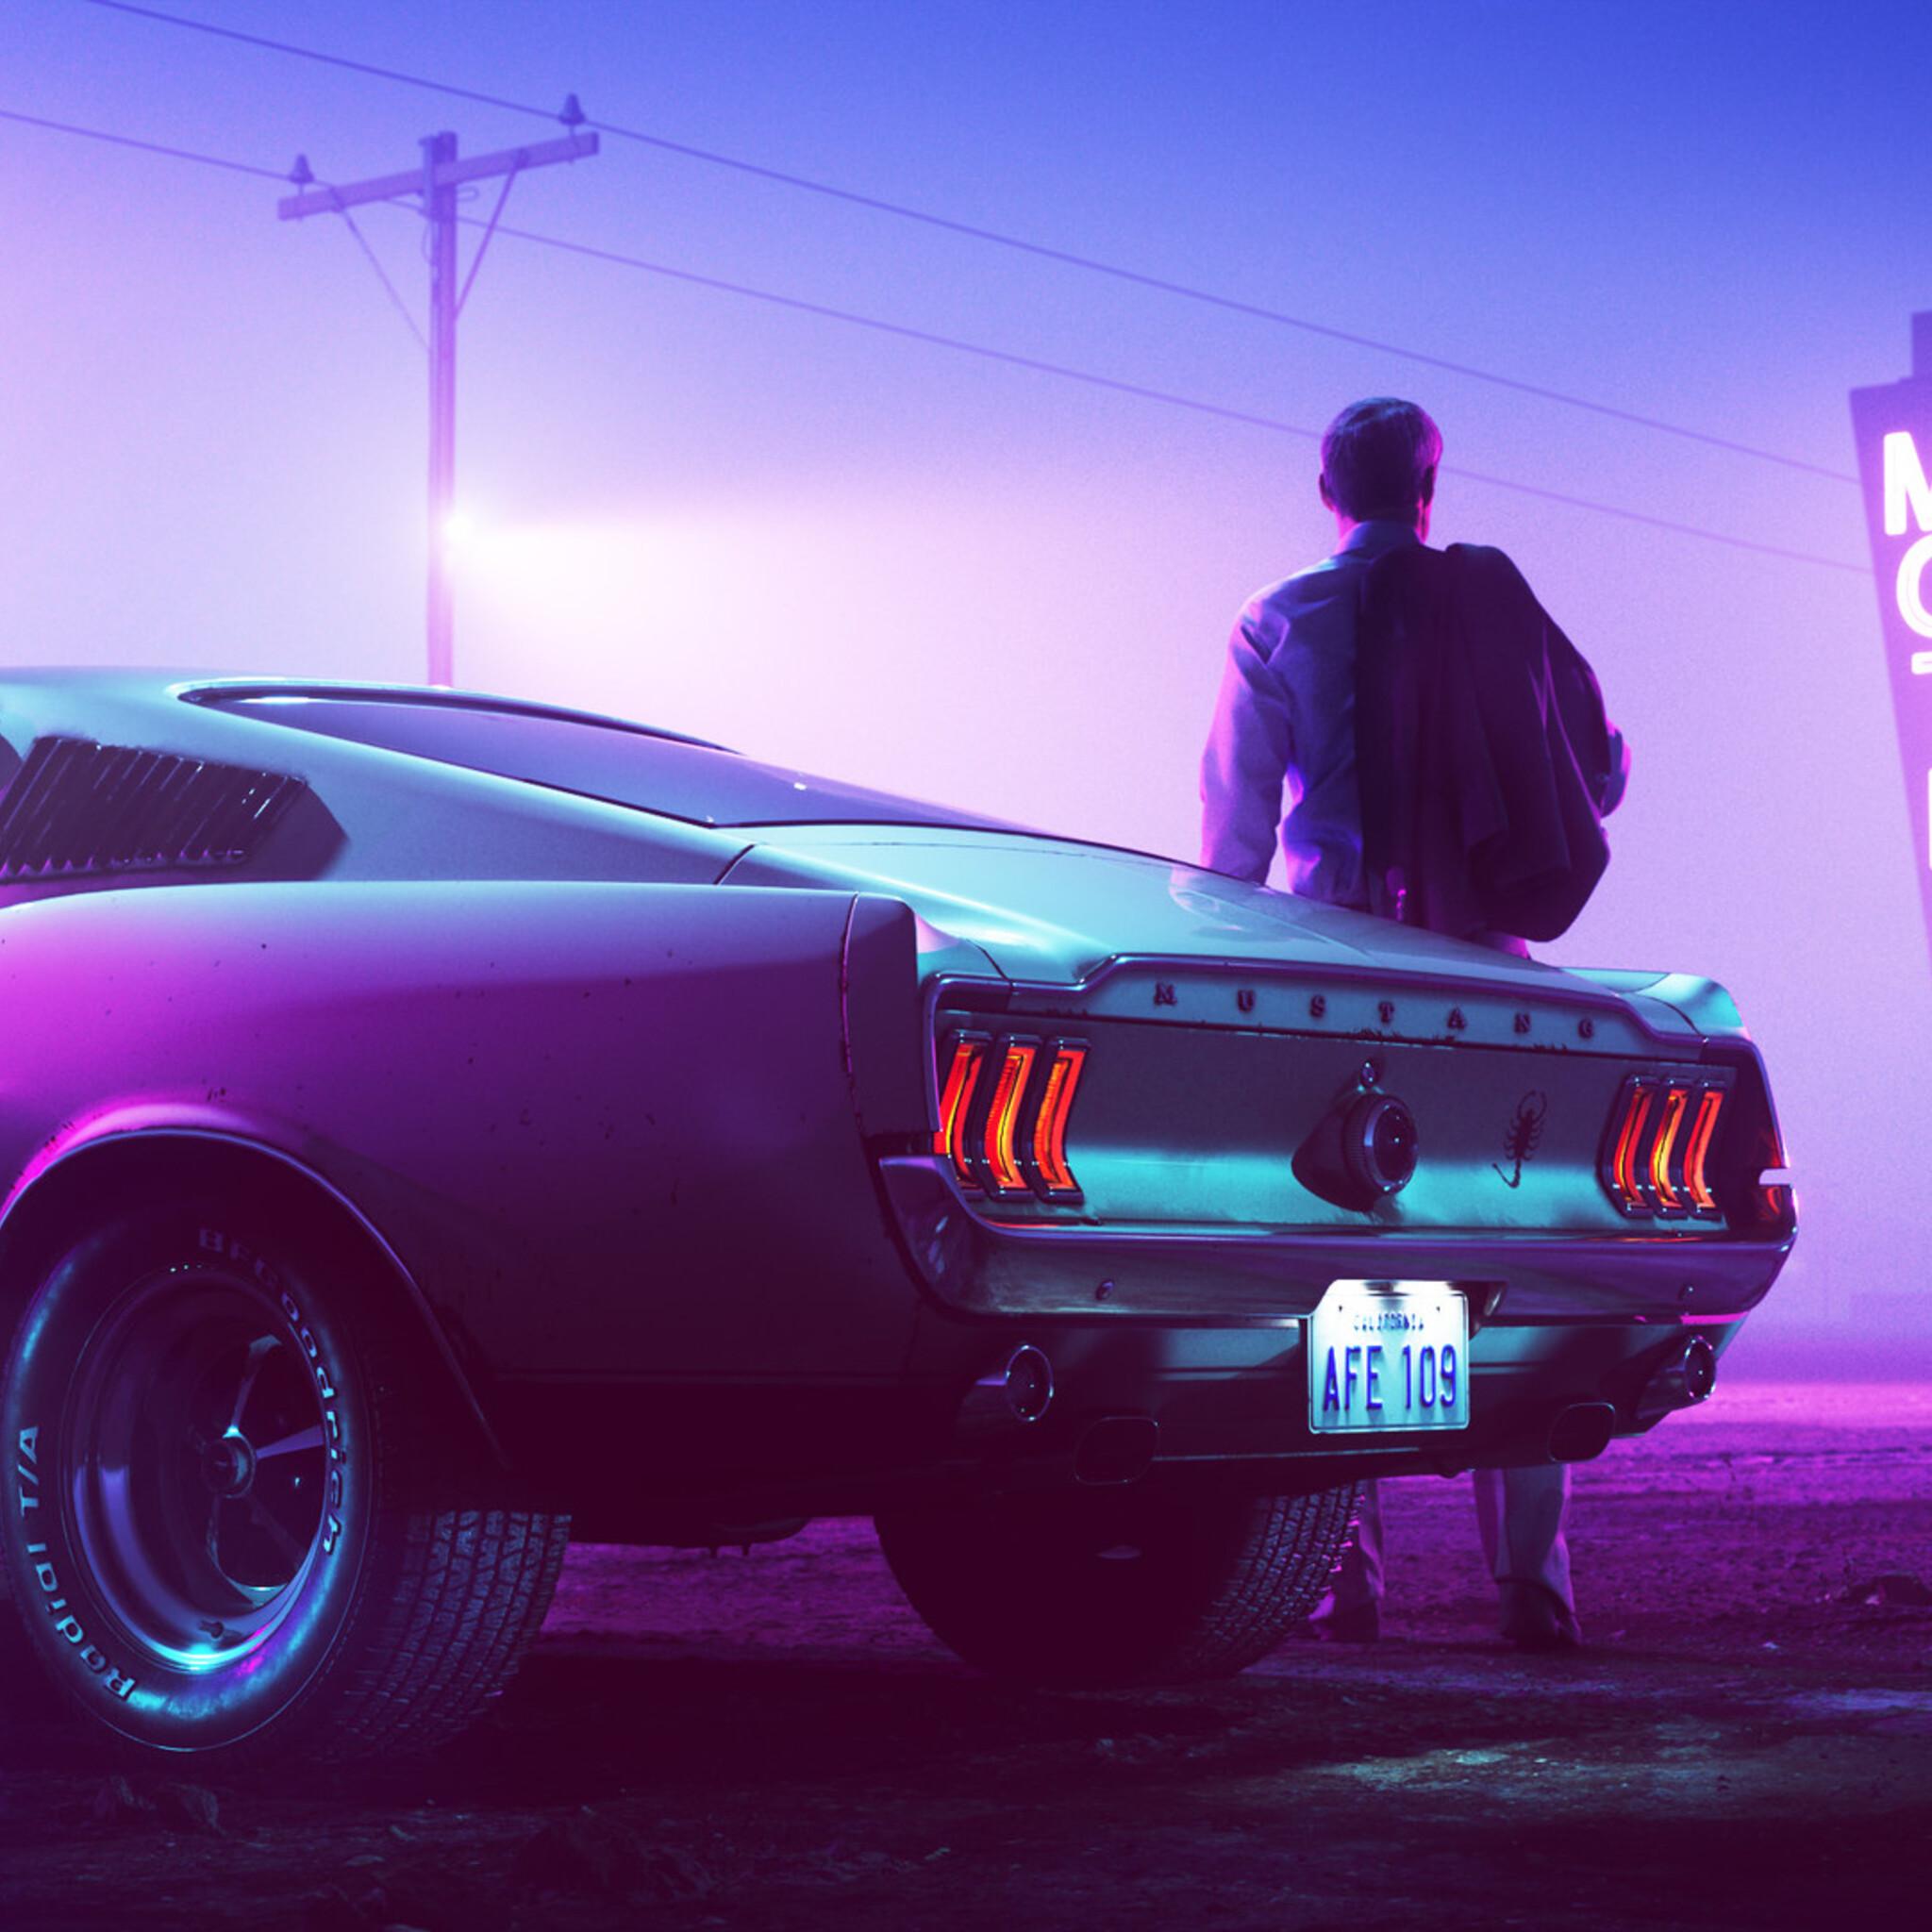 Car Hd Wallpapers 2560x1080: 2048x2048 Colorsponge Carlos Mustang Ipad Air HD 4k